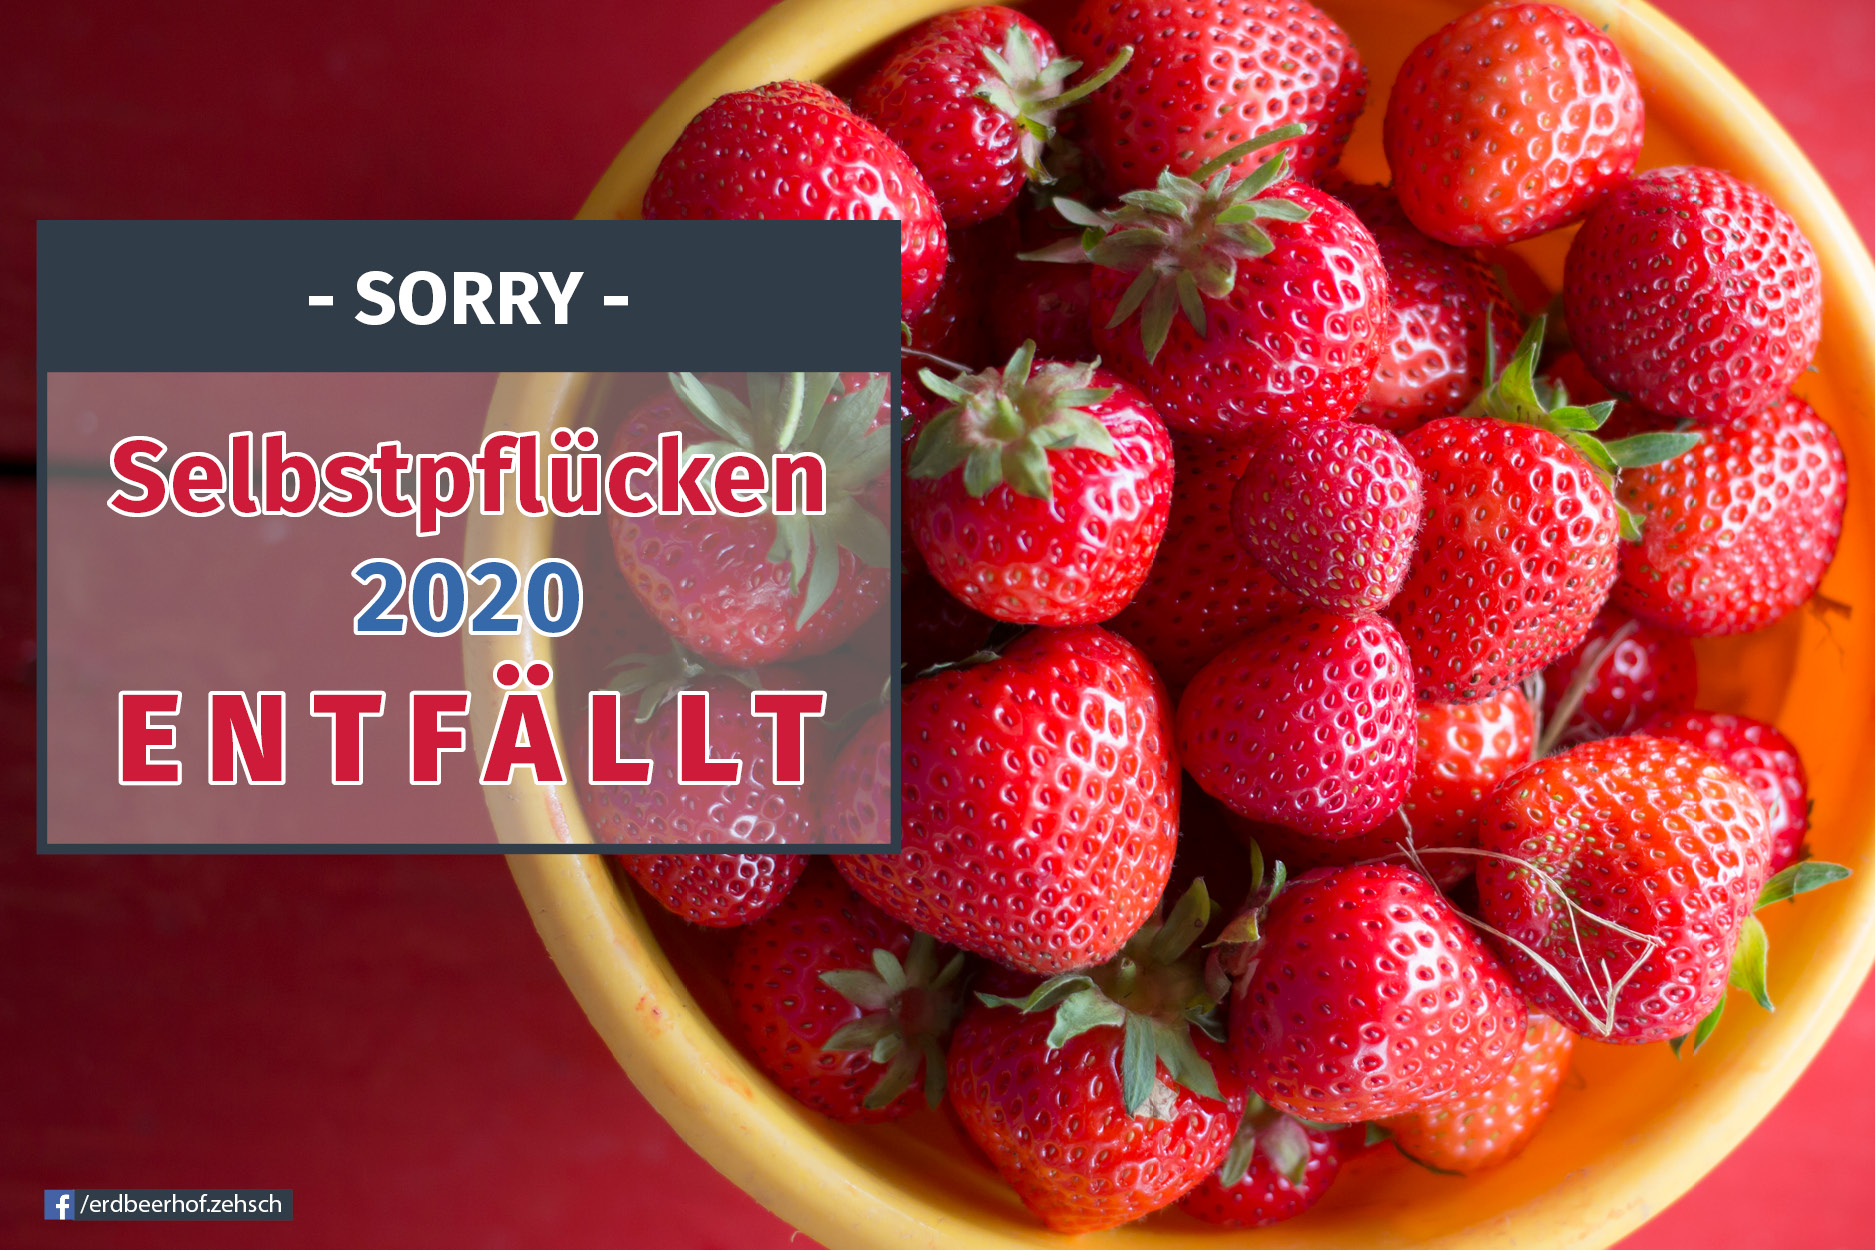 Erdbeerselbstpfluecke entfaellt